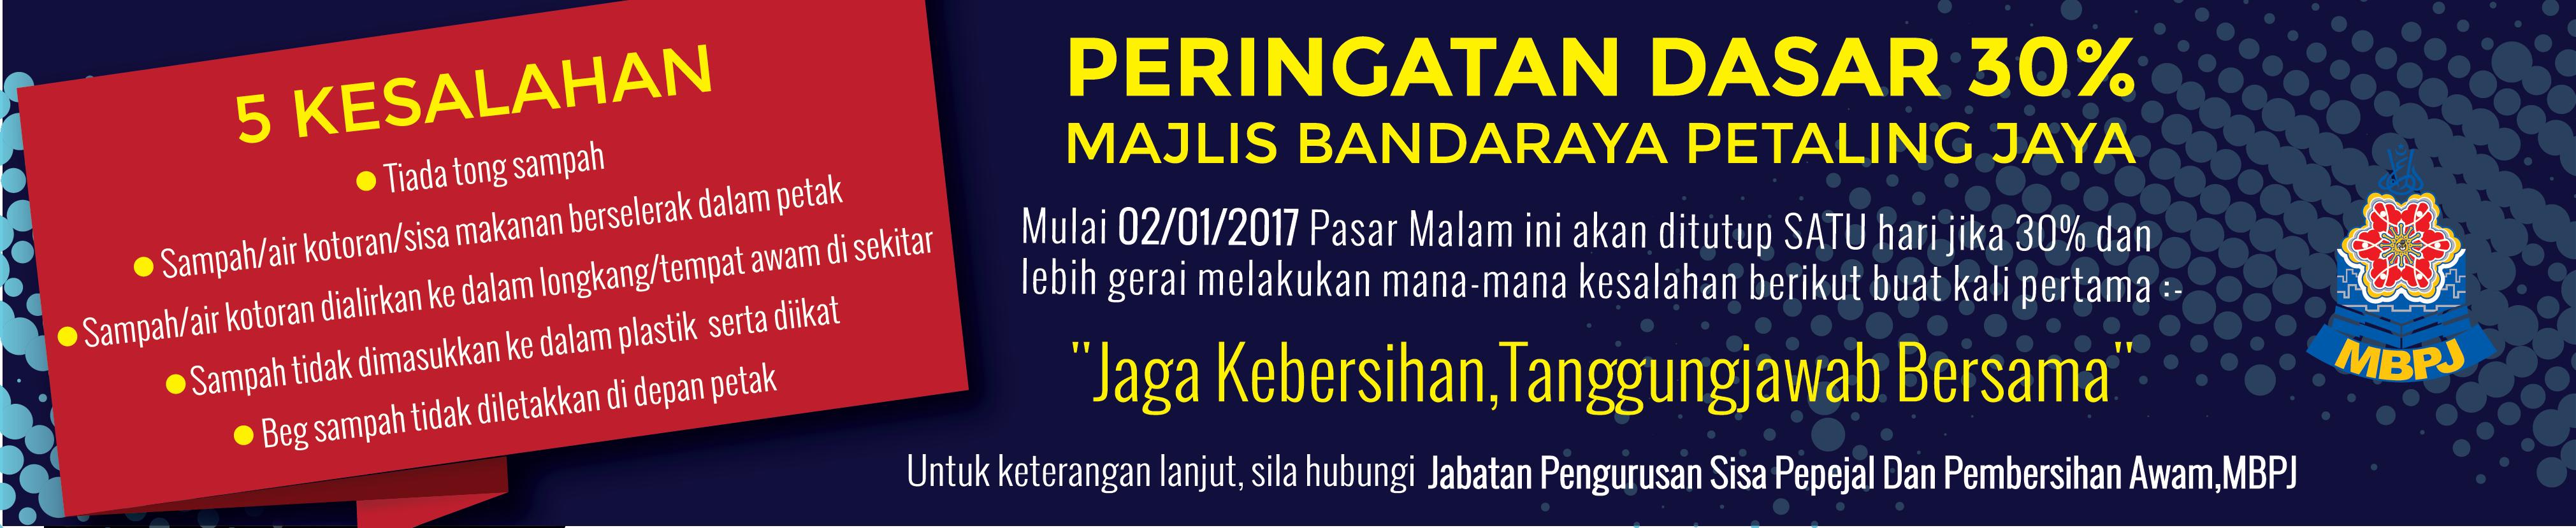 Banner Pasar Malam